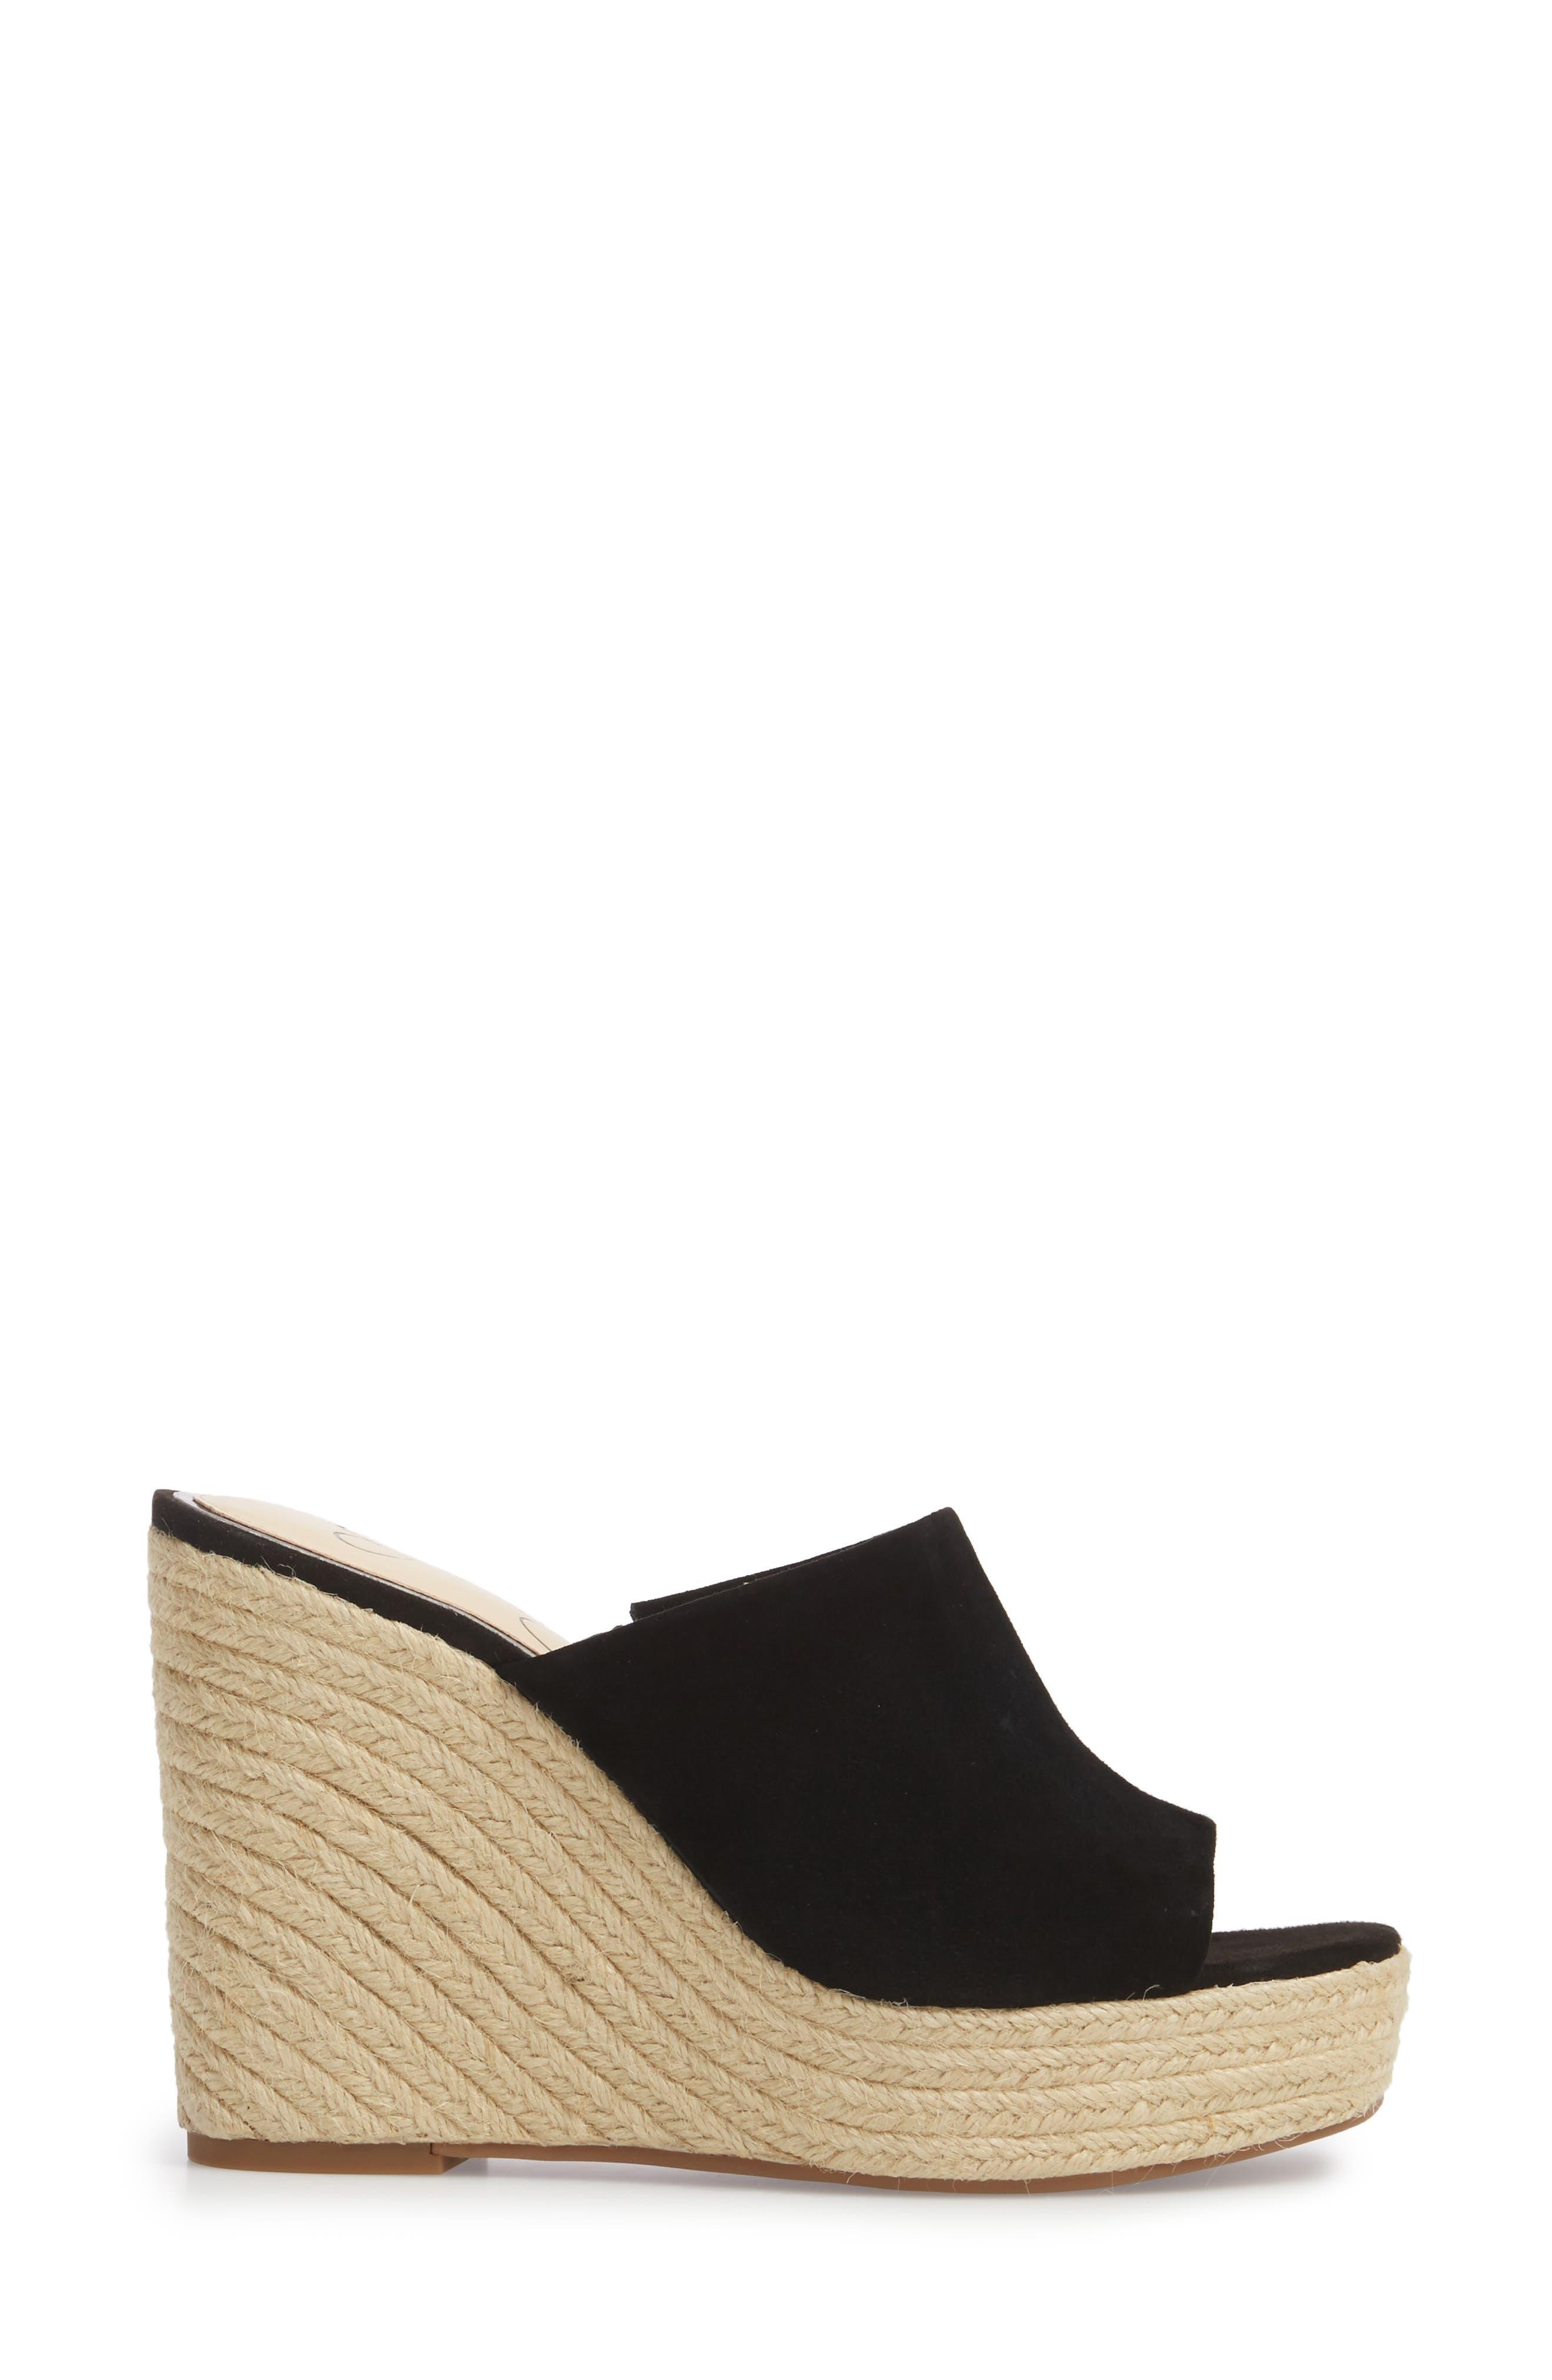 Sirella Platform Wedge Slide Sandal,                             Alternate thumbnail 7, color,